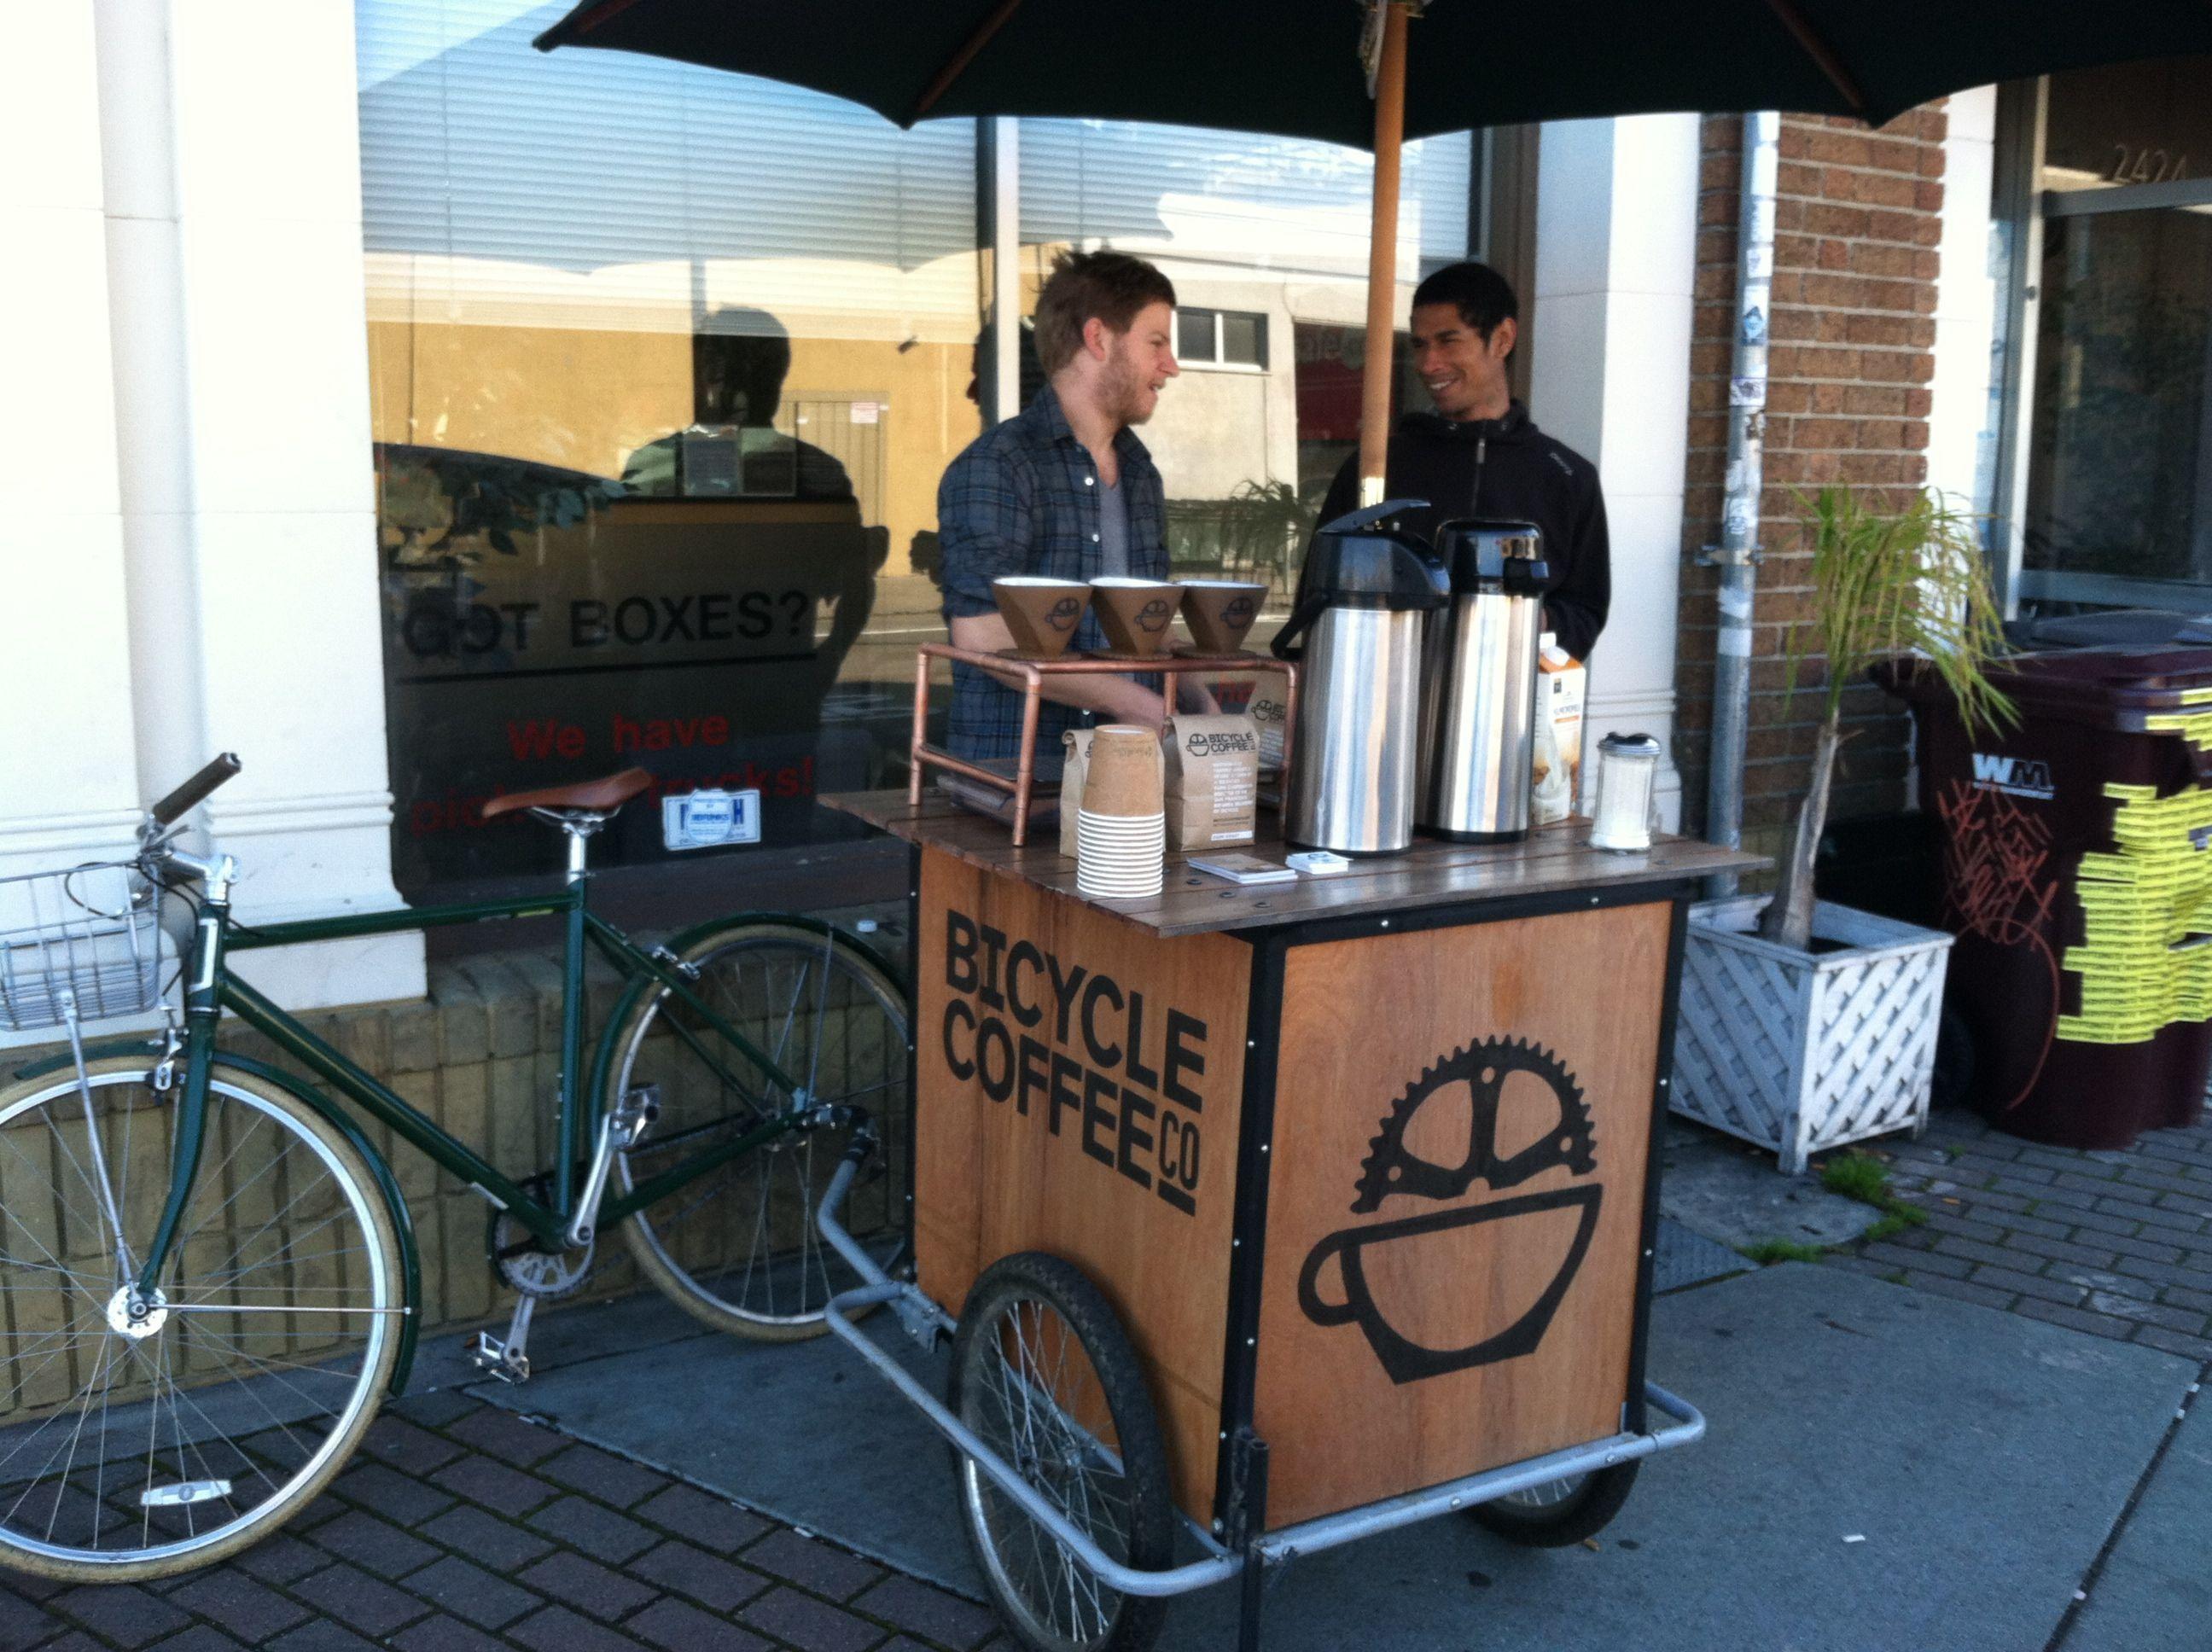 bicycle coffee logo - Google Search